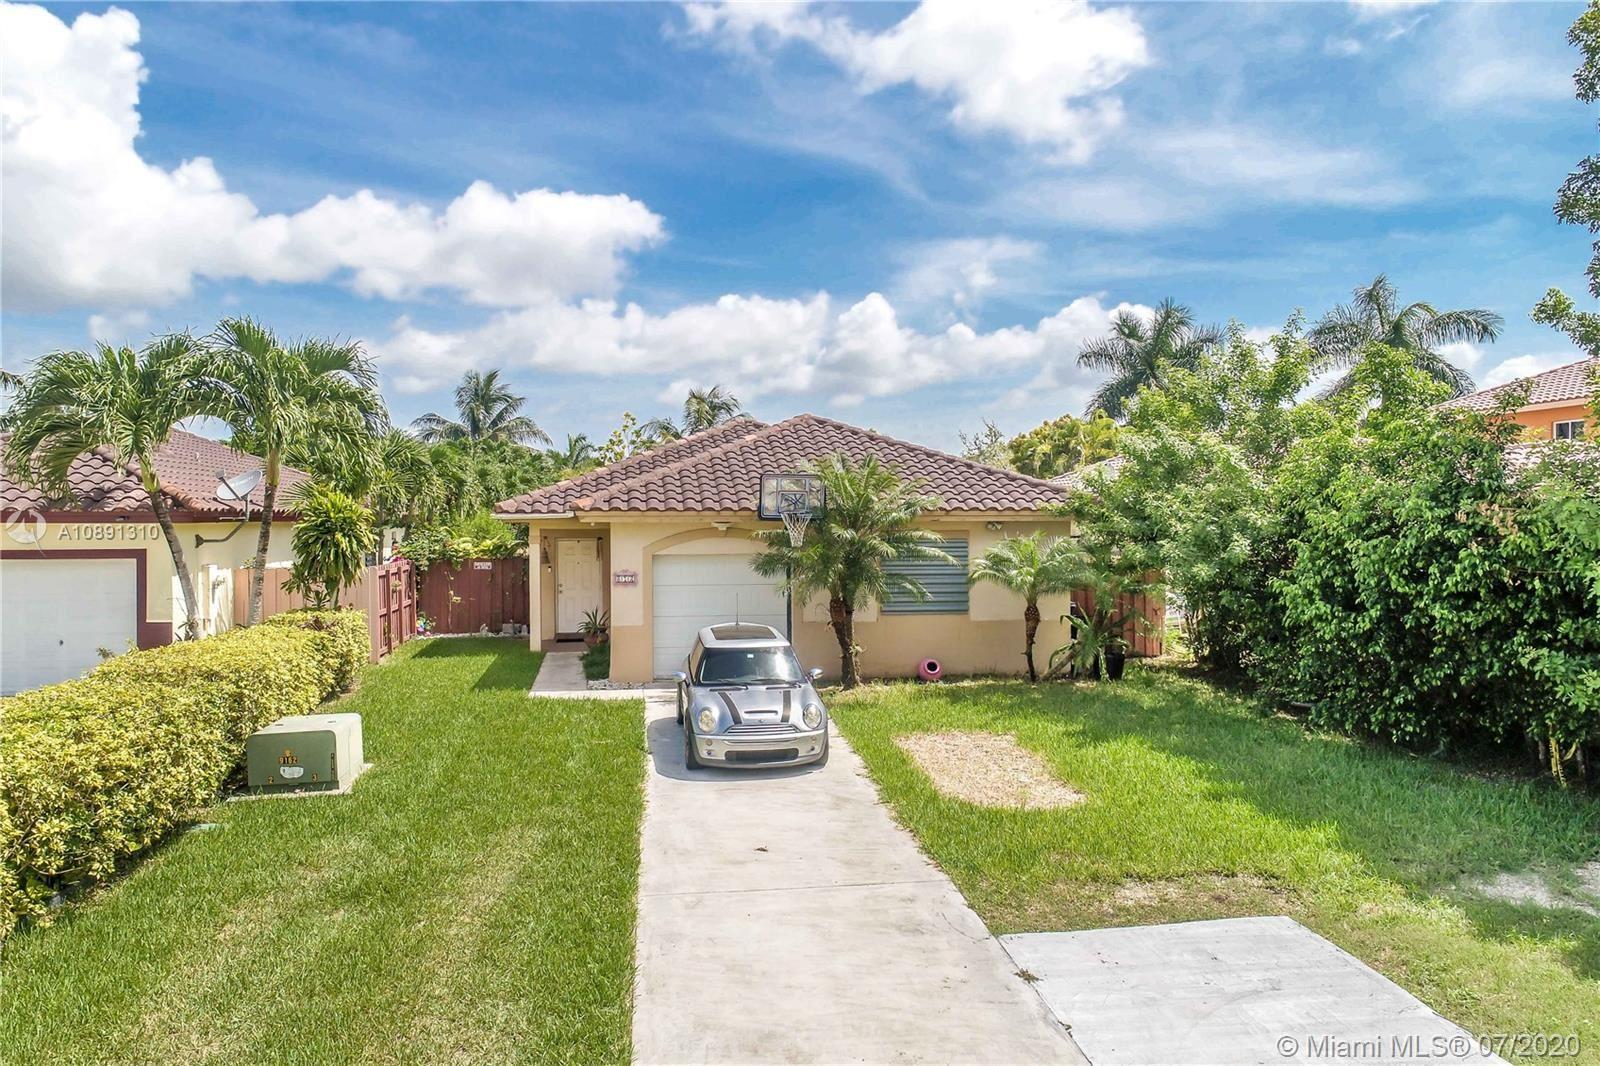 872 SW 7th St, Florida City, FL 33034 - #: A10891310